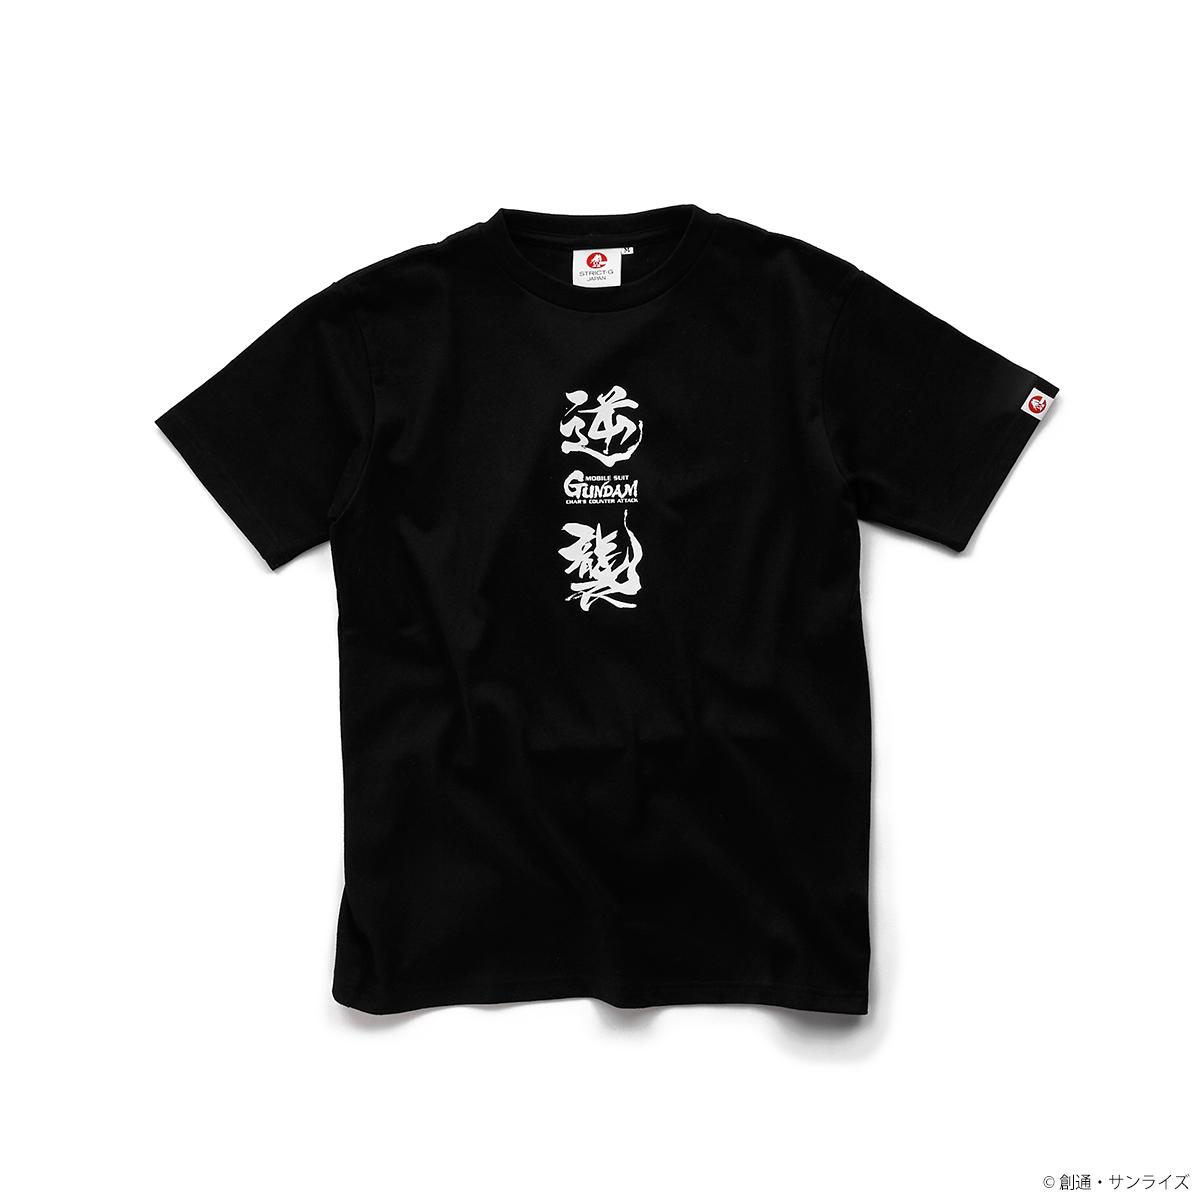 STRICT-G JAPAN『機動戦士ガンダム 逆襲のシャア』シリーズ、オンラインショップにて販売開始!